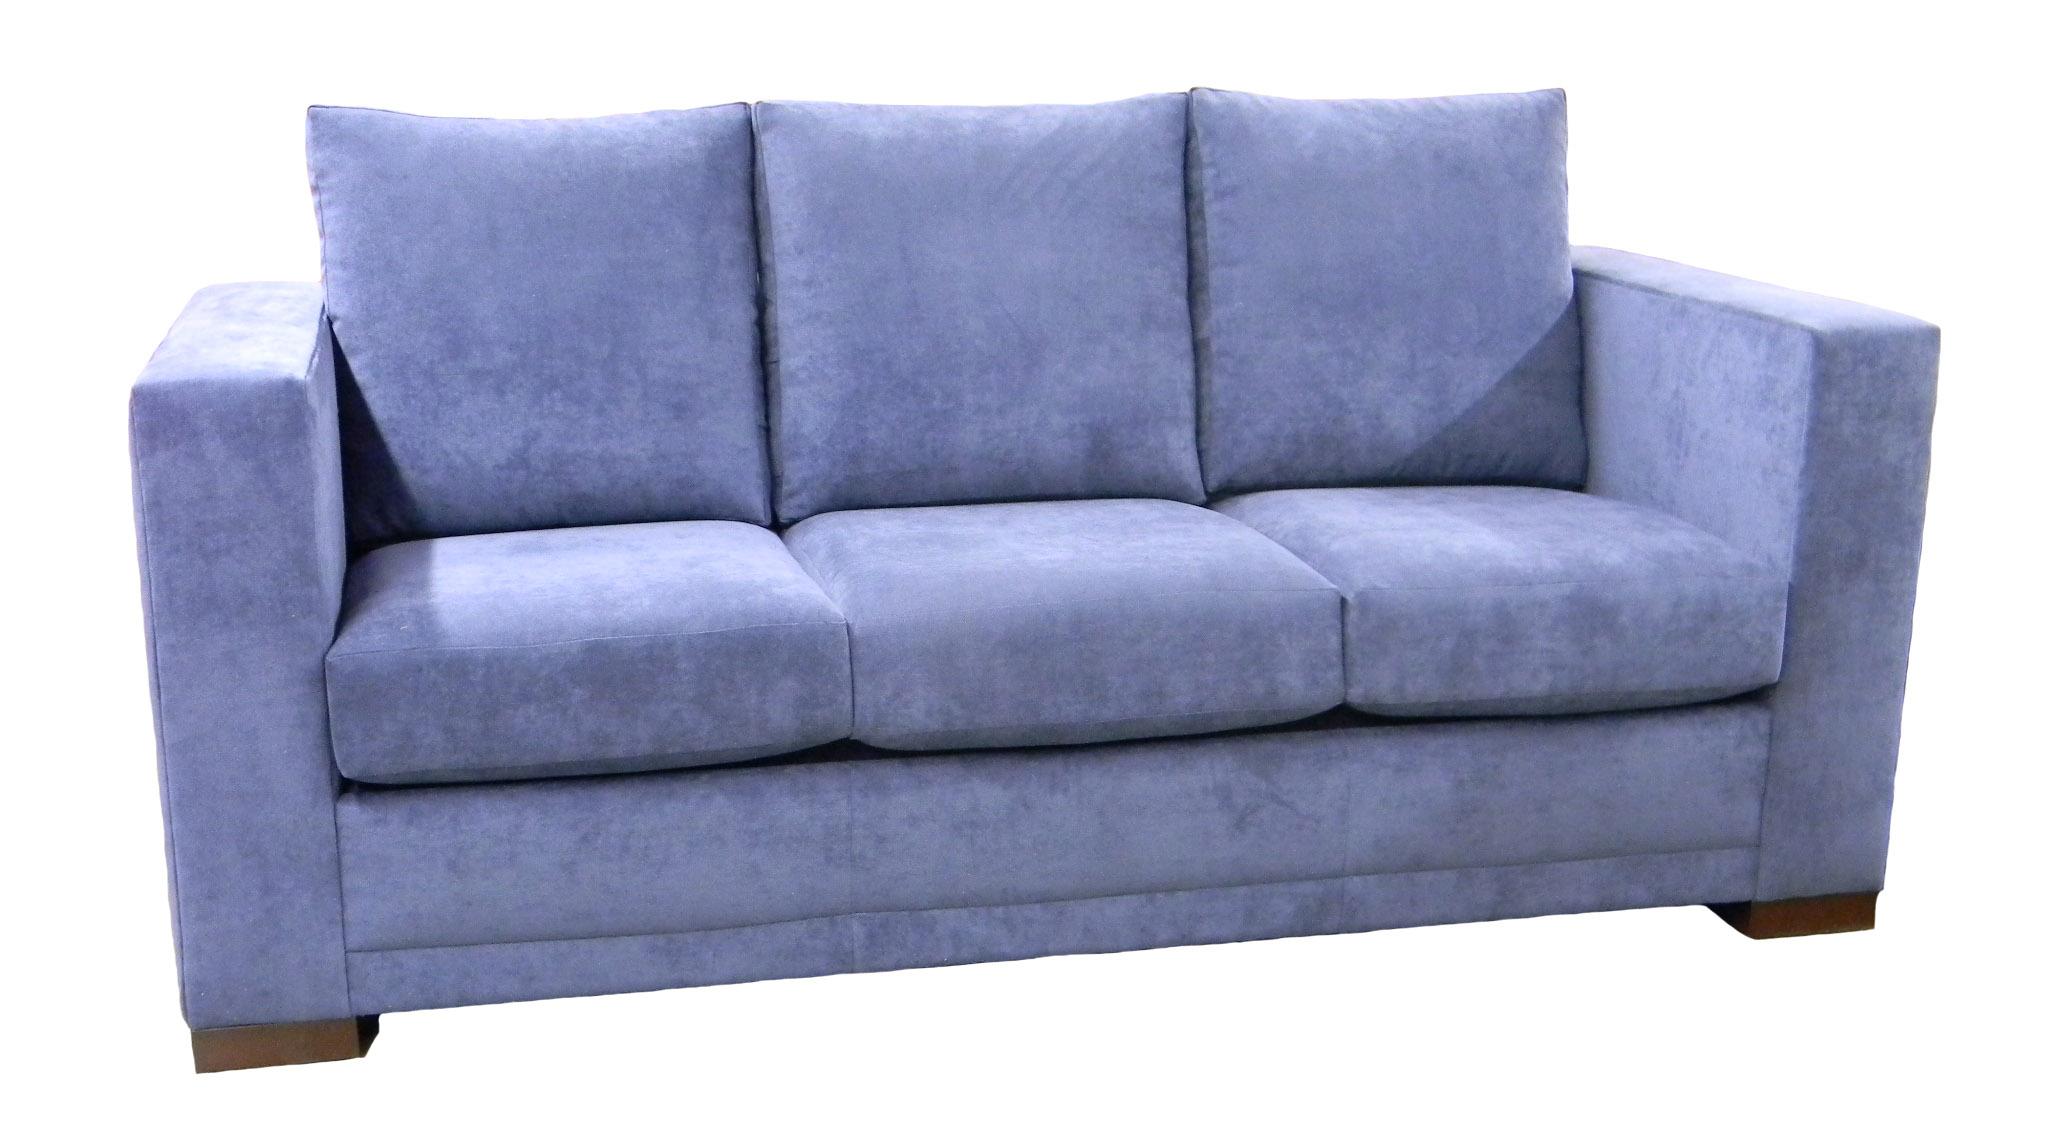 usa made sleeper sofa kyoto jasmin hardwood 3 seater futon bed marlowe queen carolina chair american